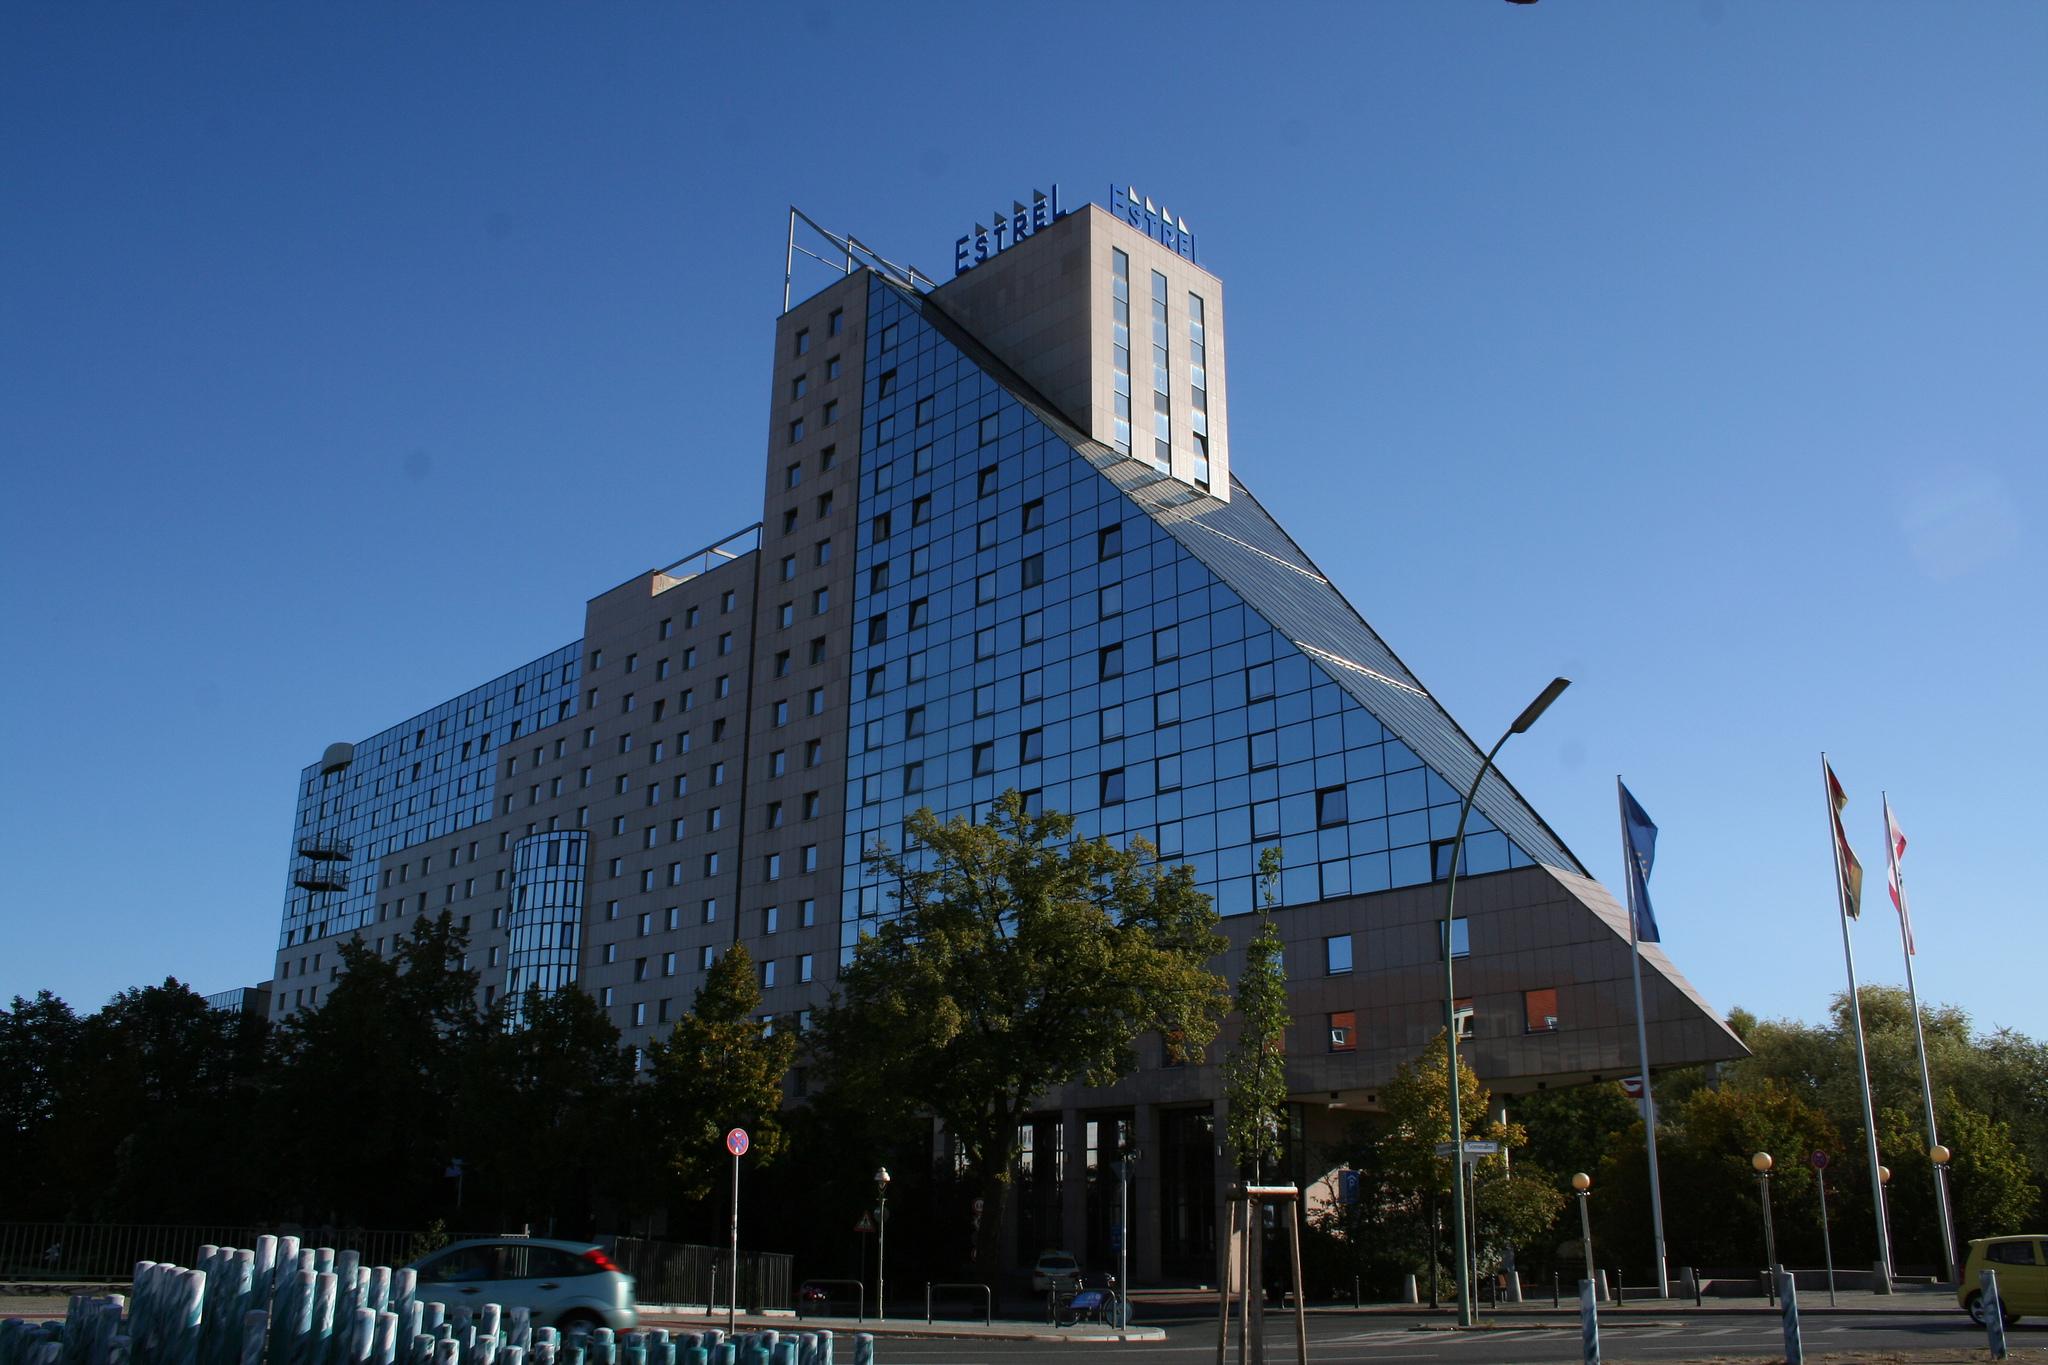 Berlin Hotel Estrel Stars In Concert